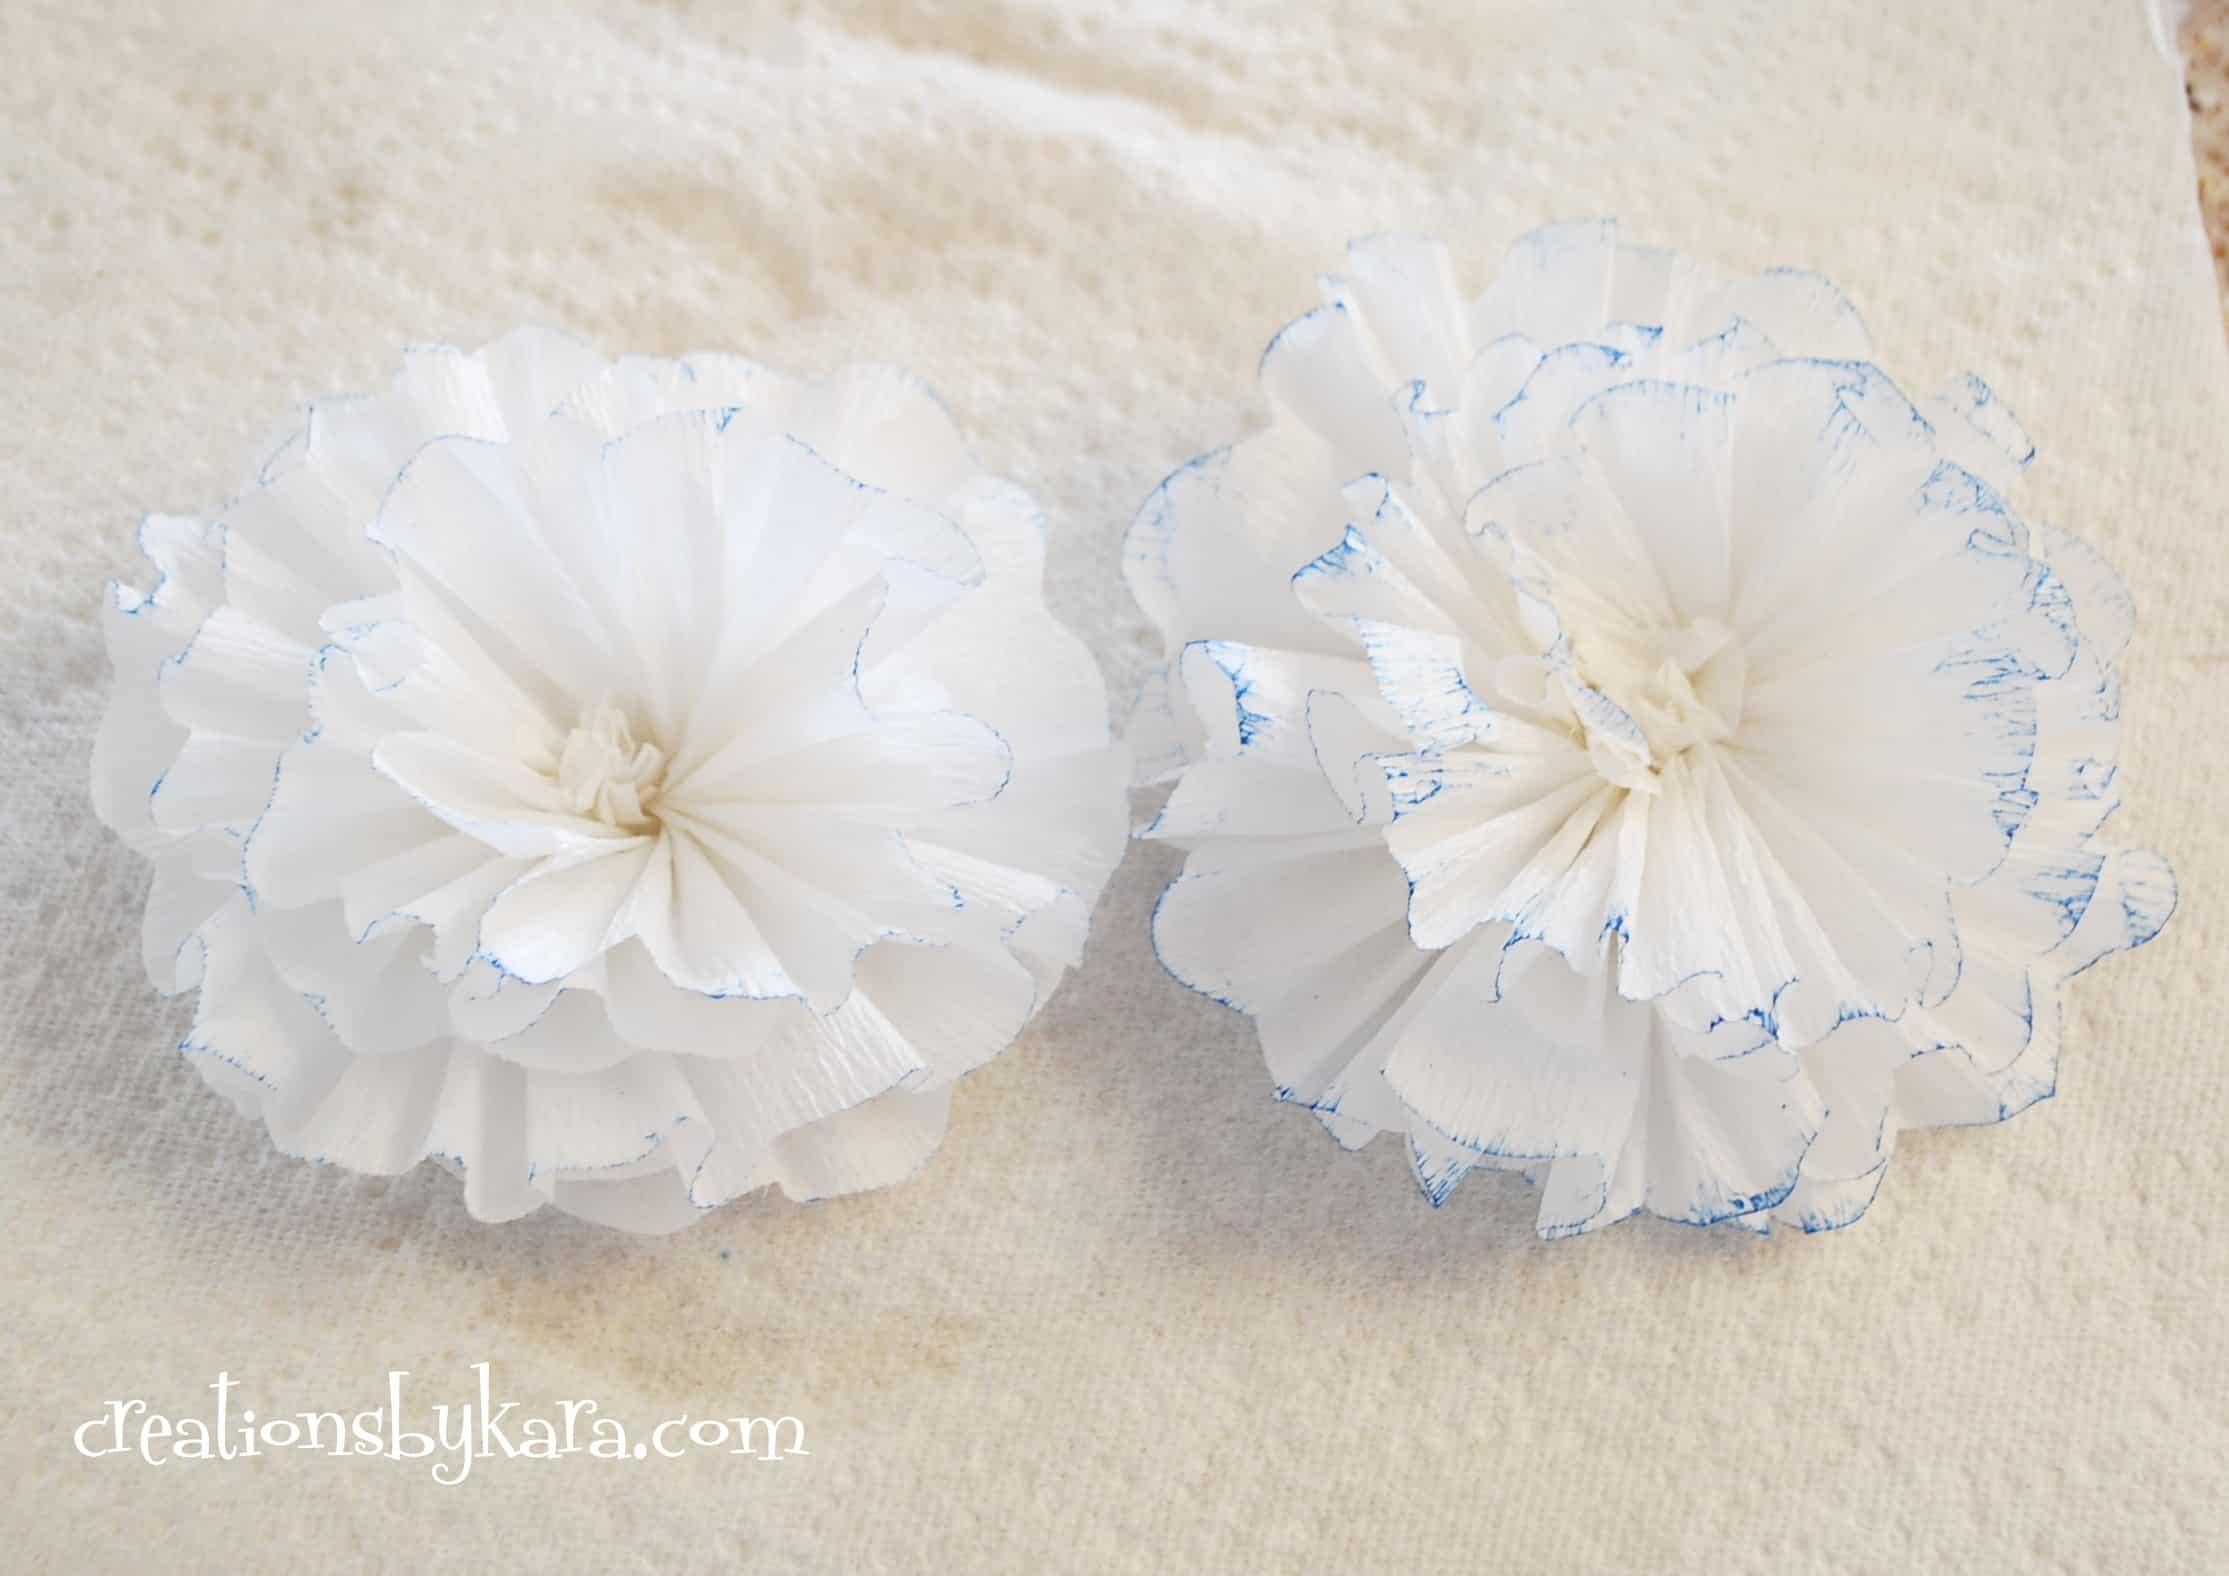 Crepe paper flower tutorial 033 creations by kara for Crepe paper wall flowers